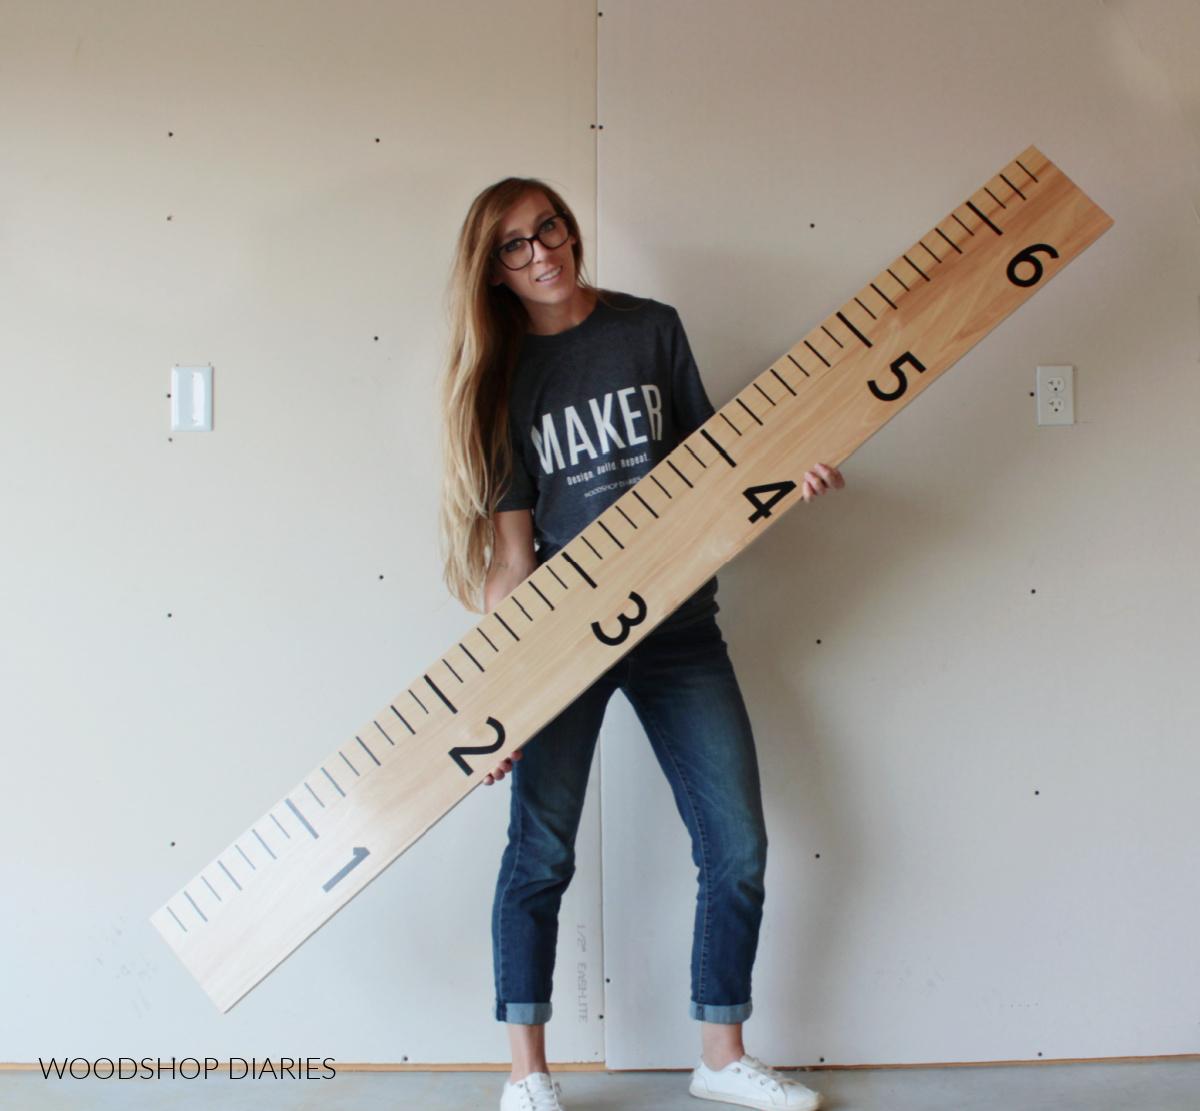 Shara Woodshop Diaries holding life size ruler board